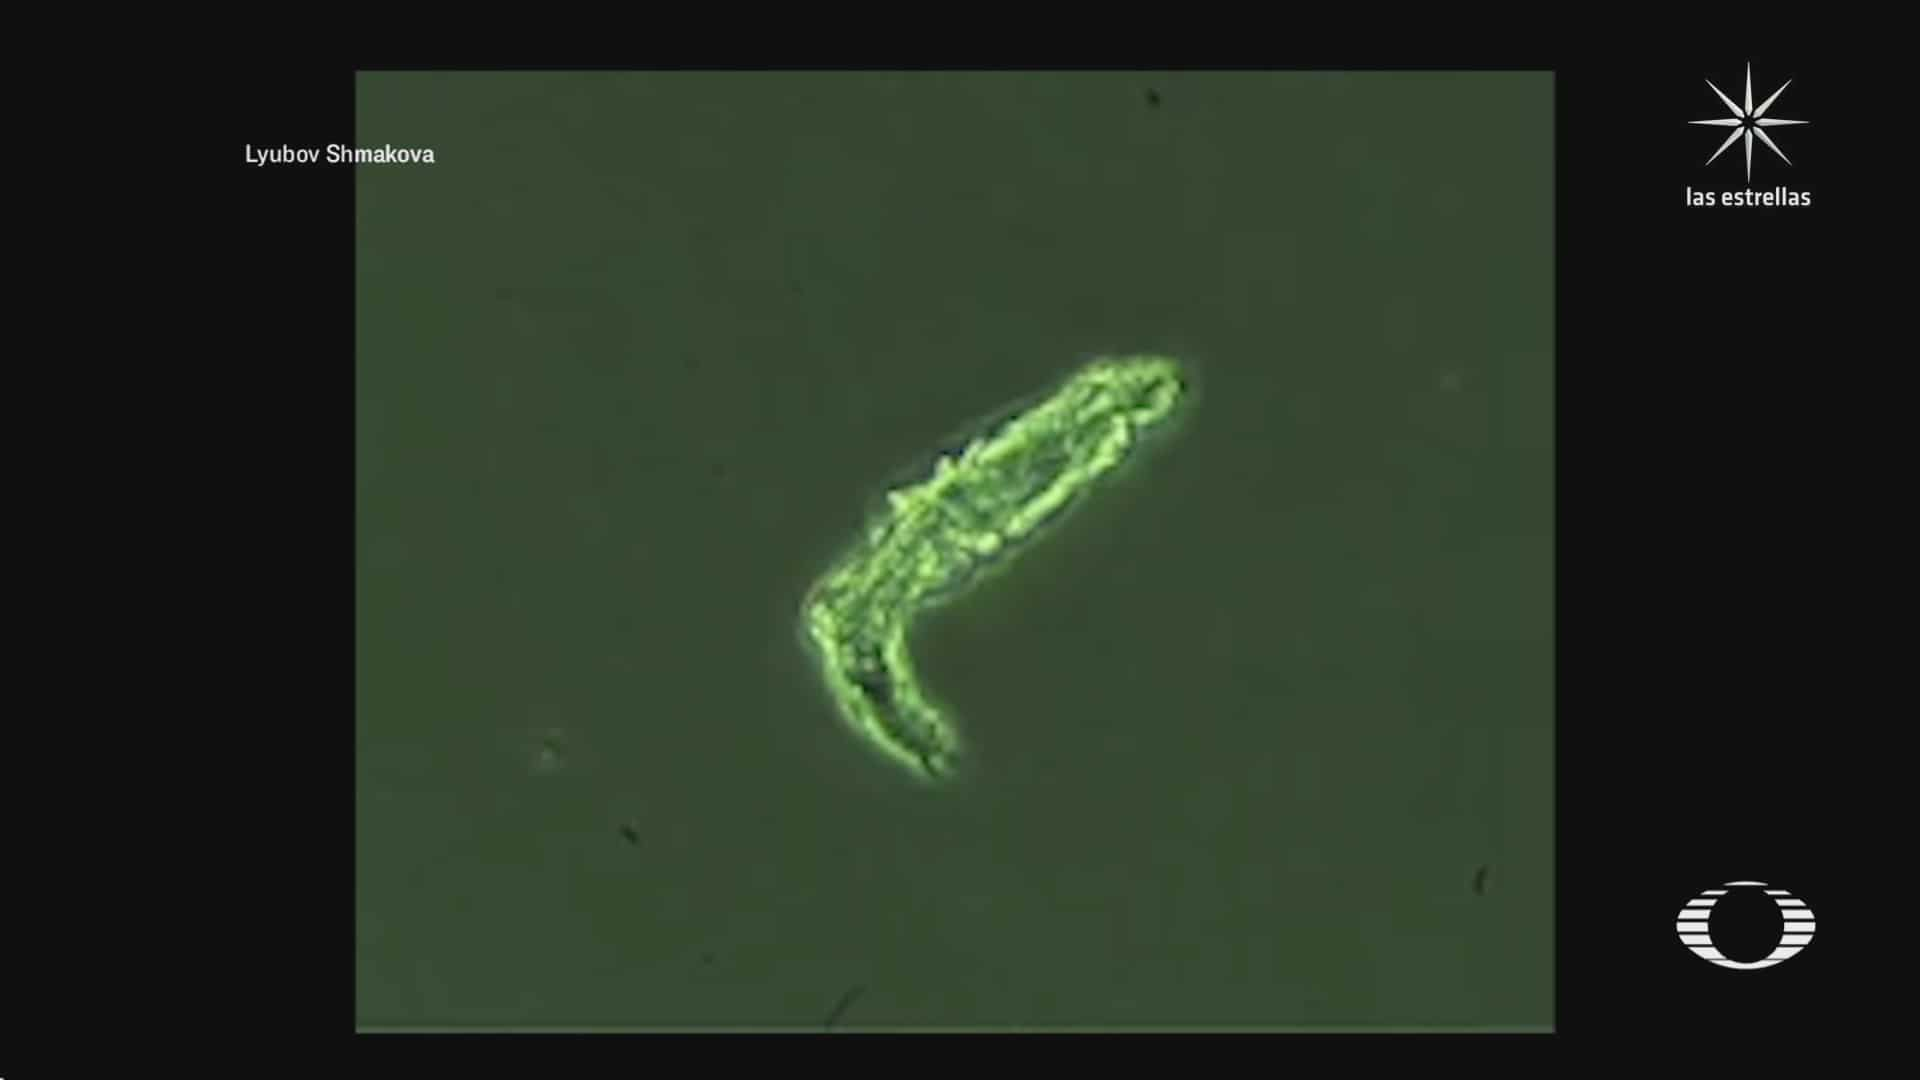 reaniman a microbio que paso congelado mas de 24 mil anos